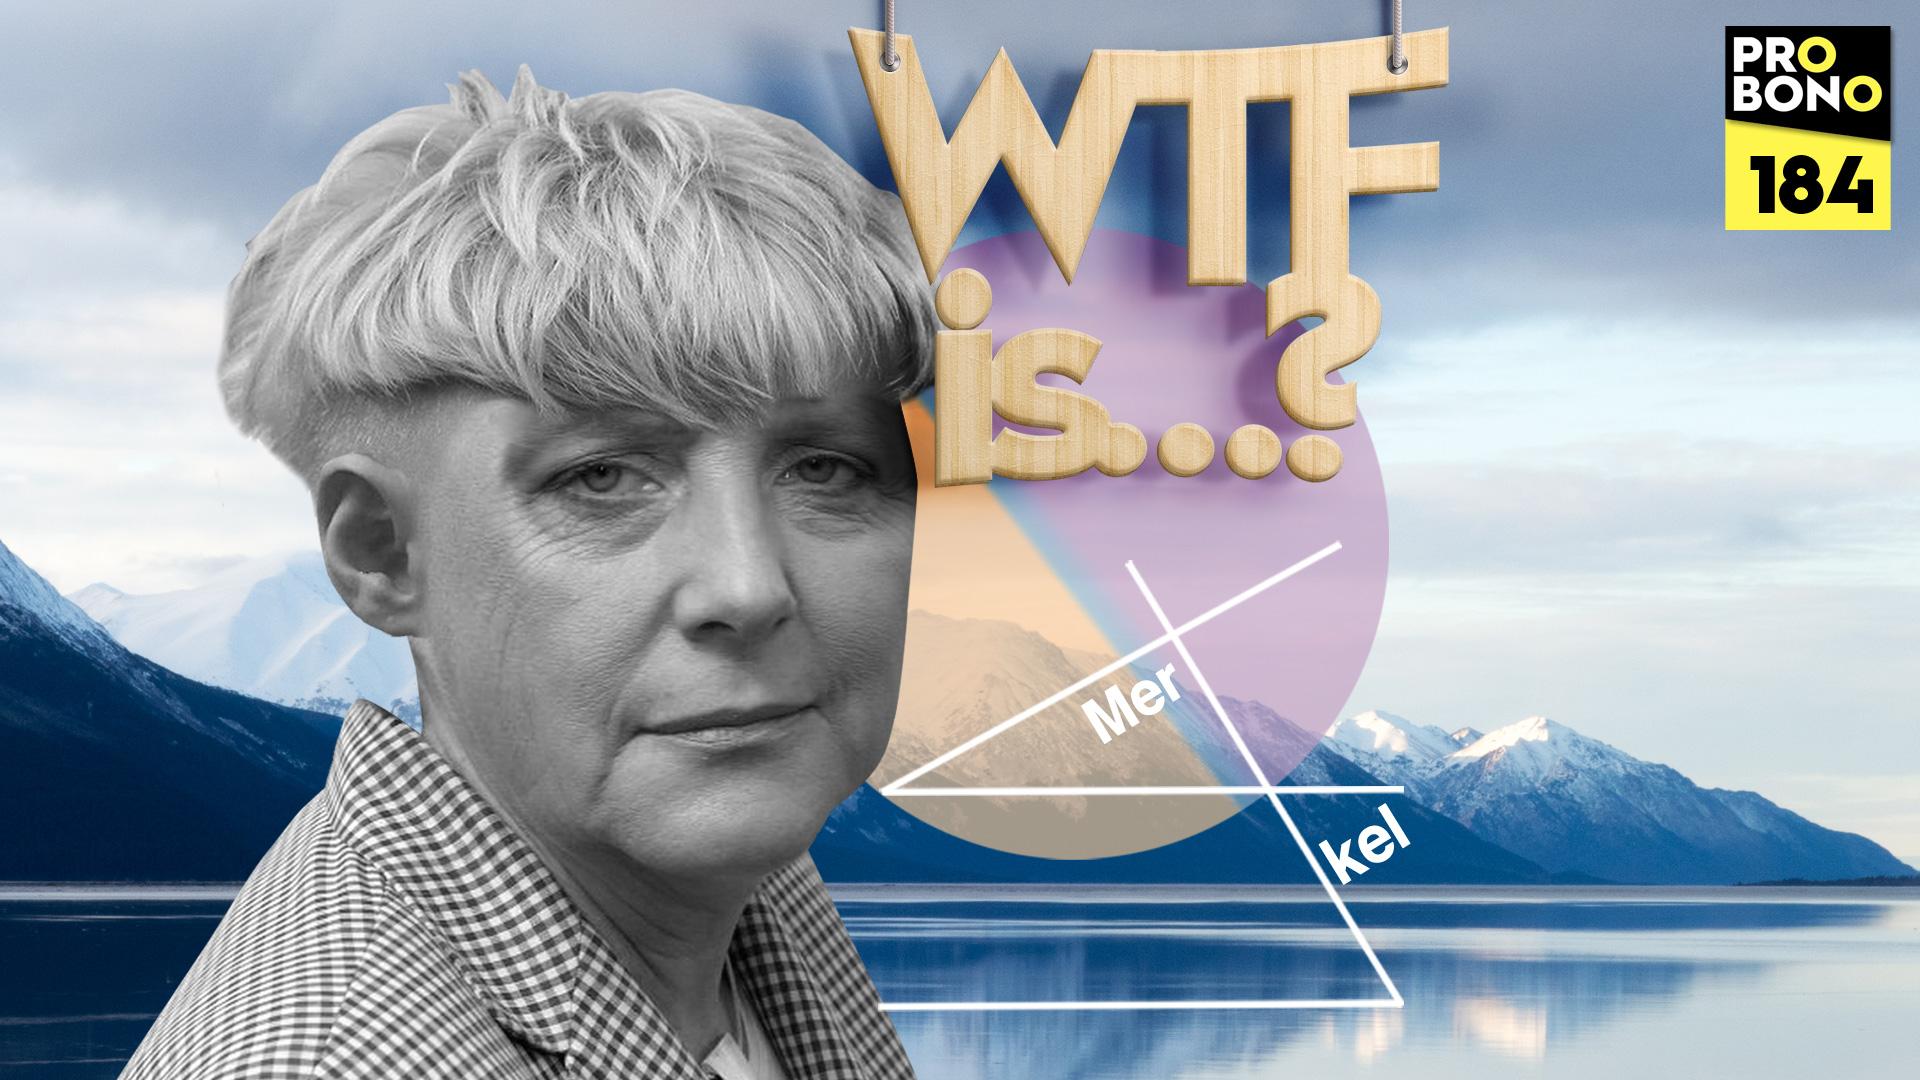 What the fuck is MERKEL? German Slow Politics explained (probono Magazin)